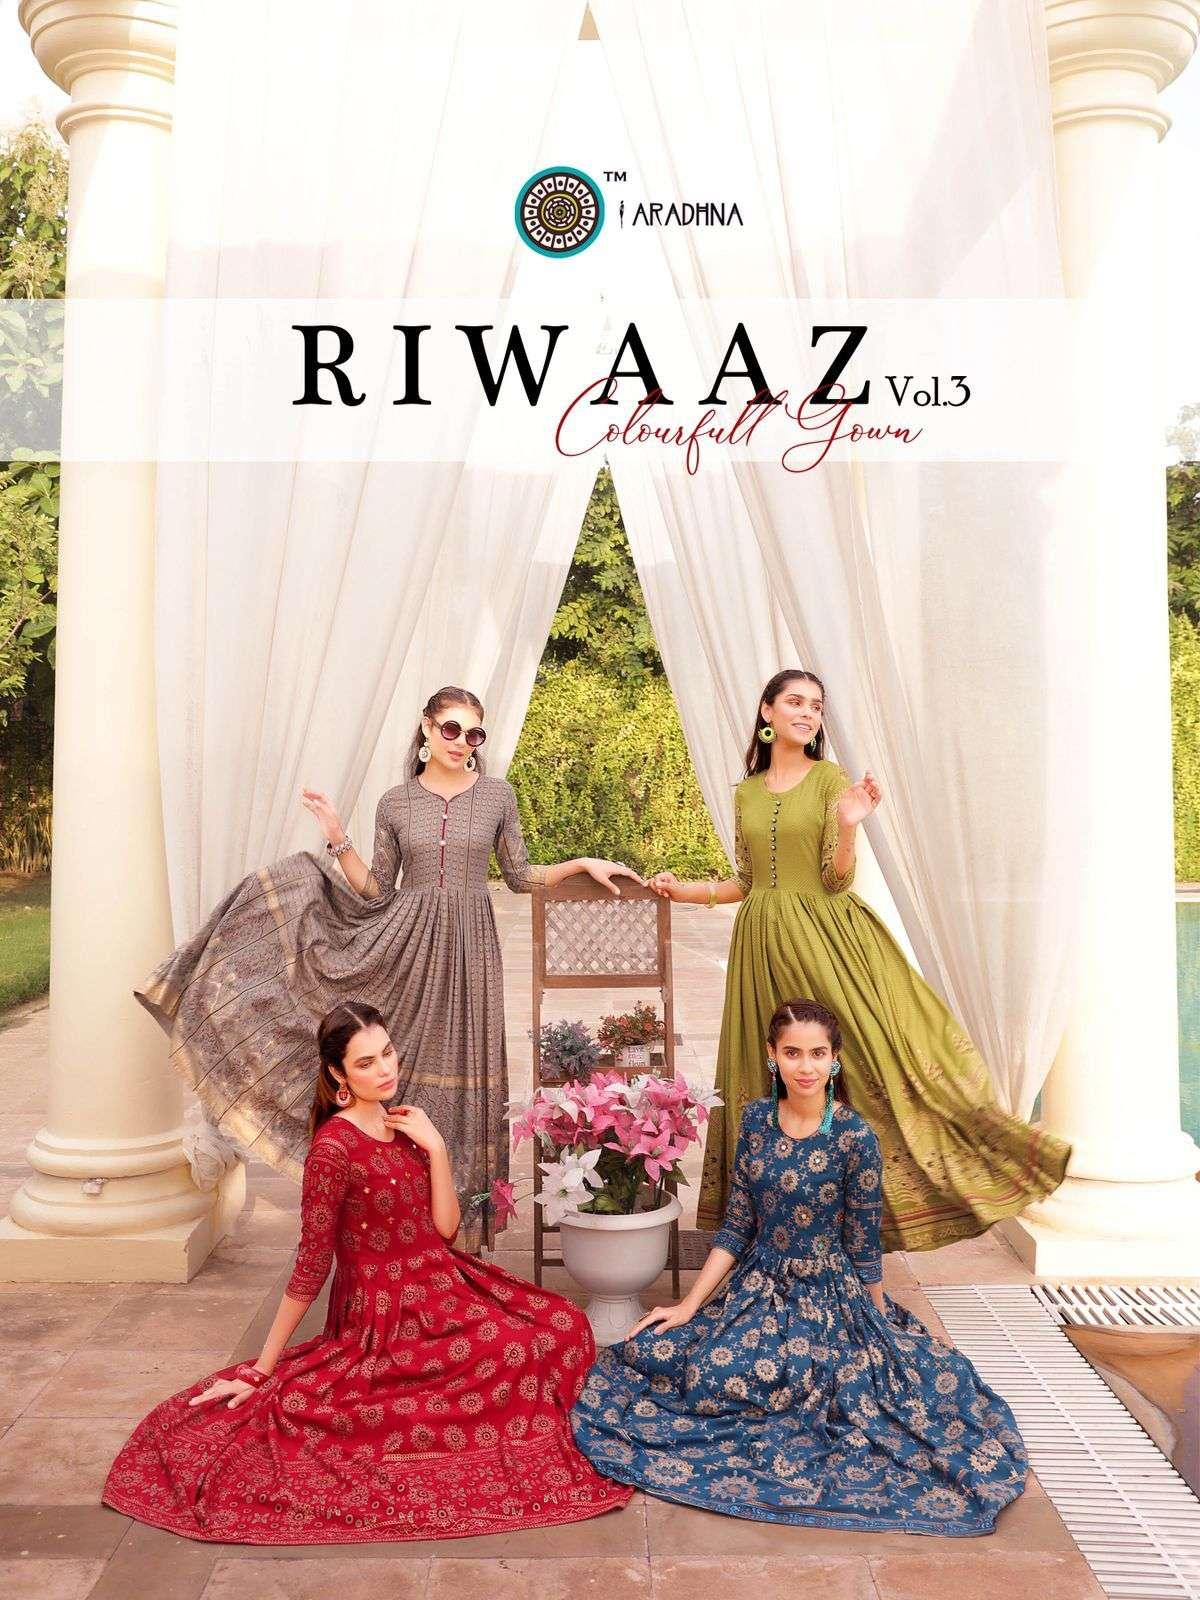 aradhna riwaaz vol 3 rayon long gown style kurtis anarkali pattern